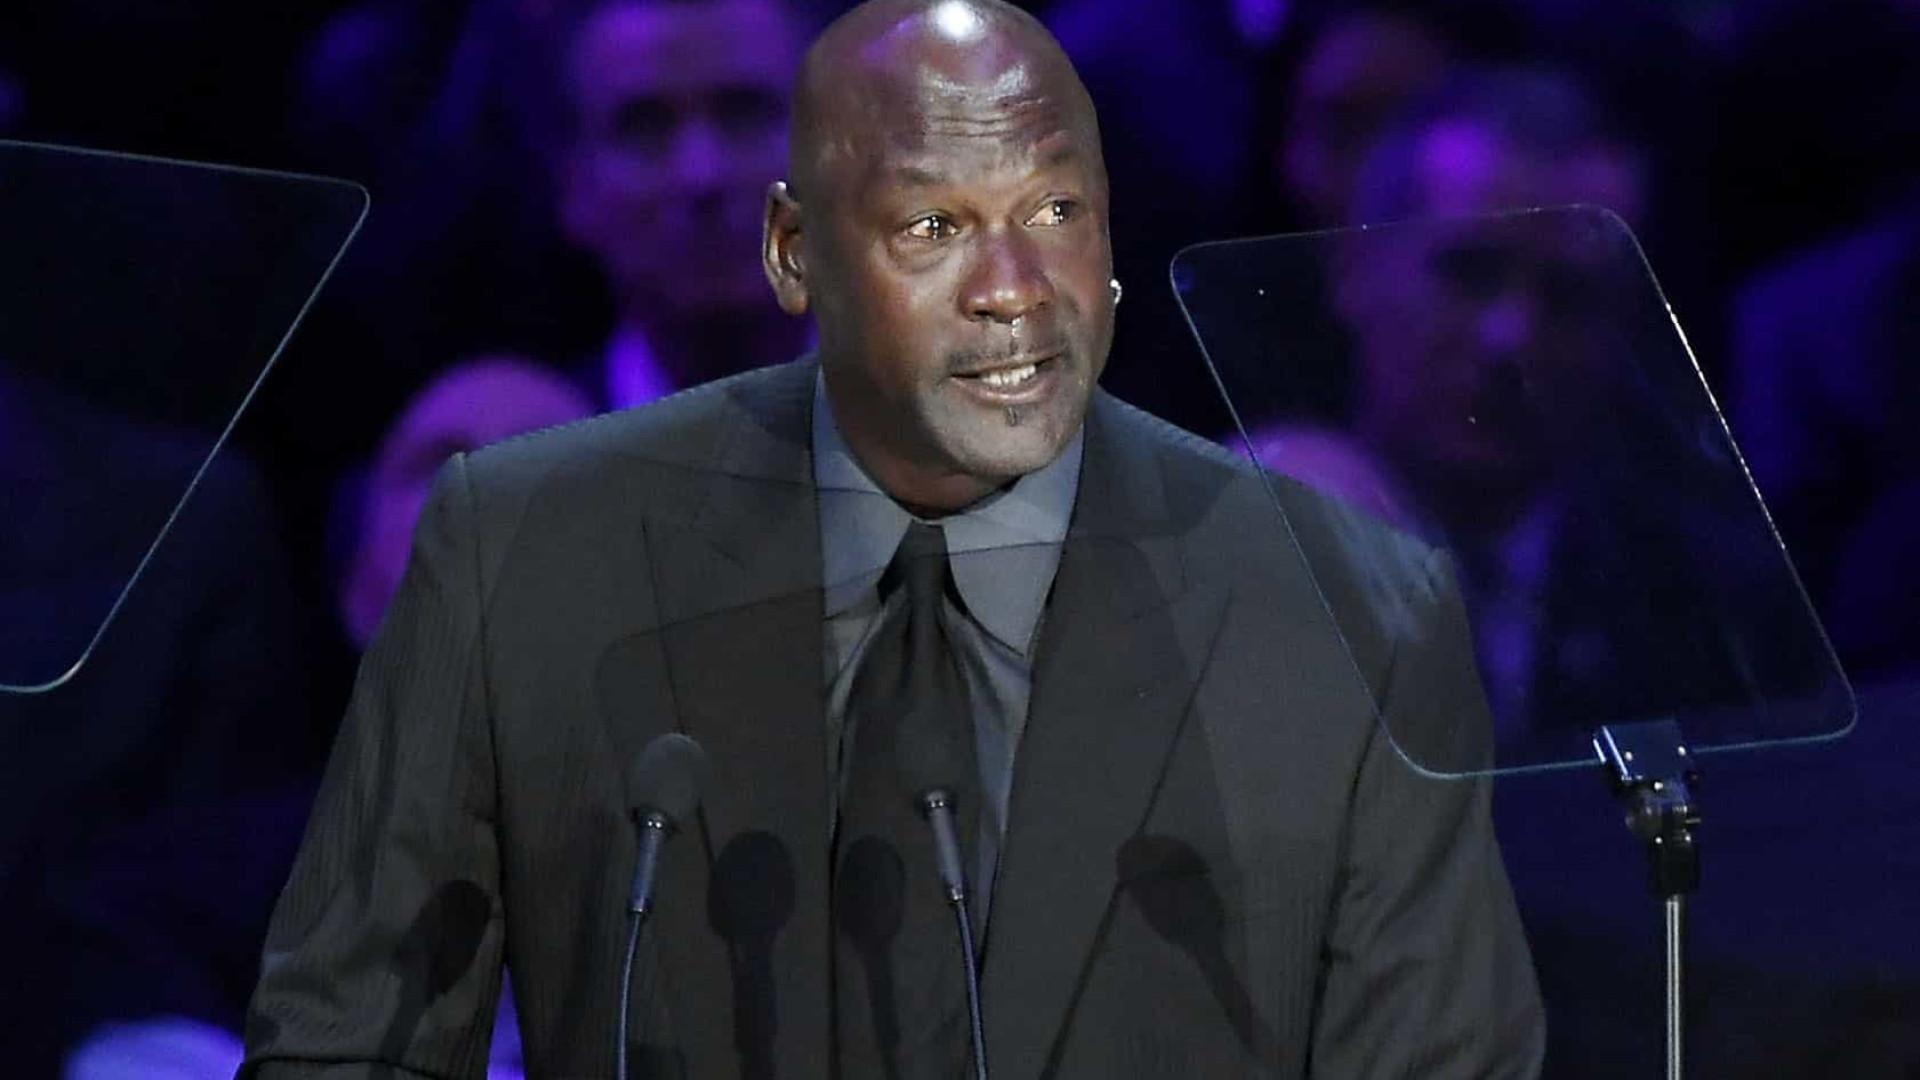 Chegada de Messi ao PSG já rendeu R$ 37 milhões a Michael Jordan